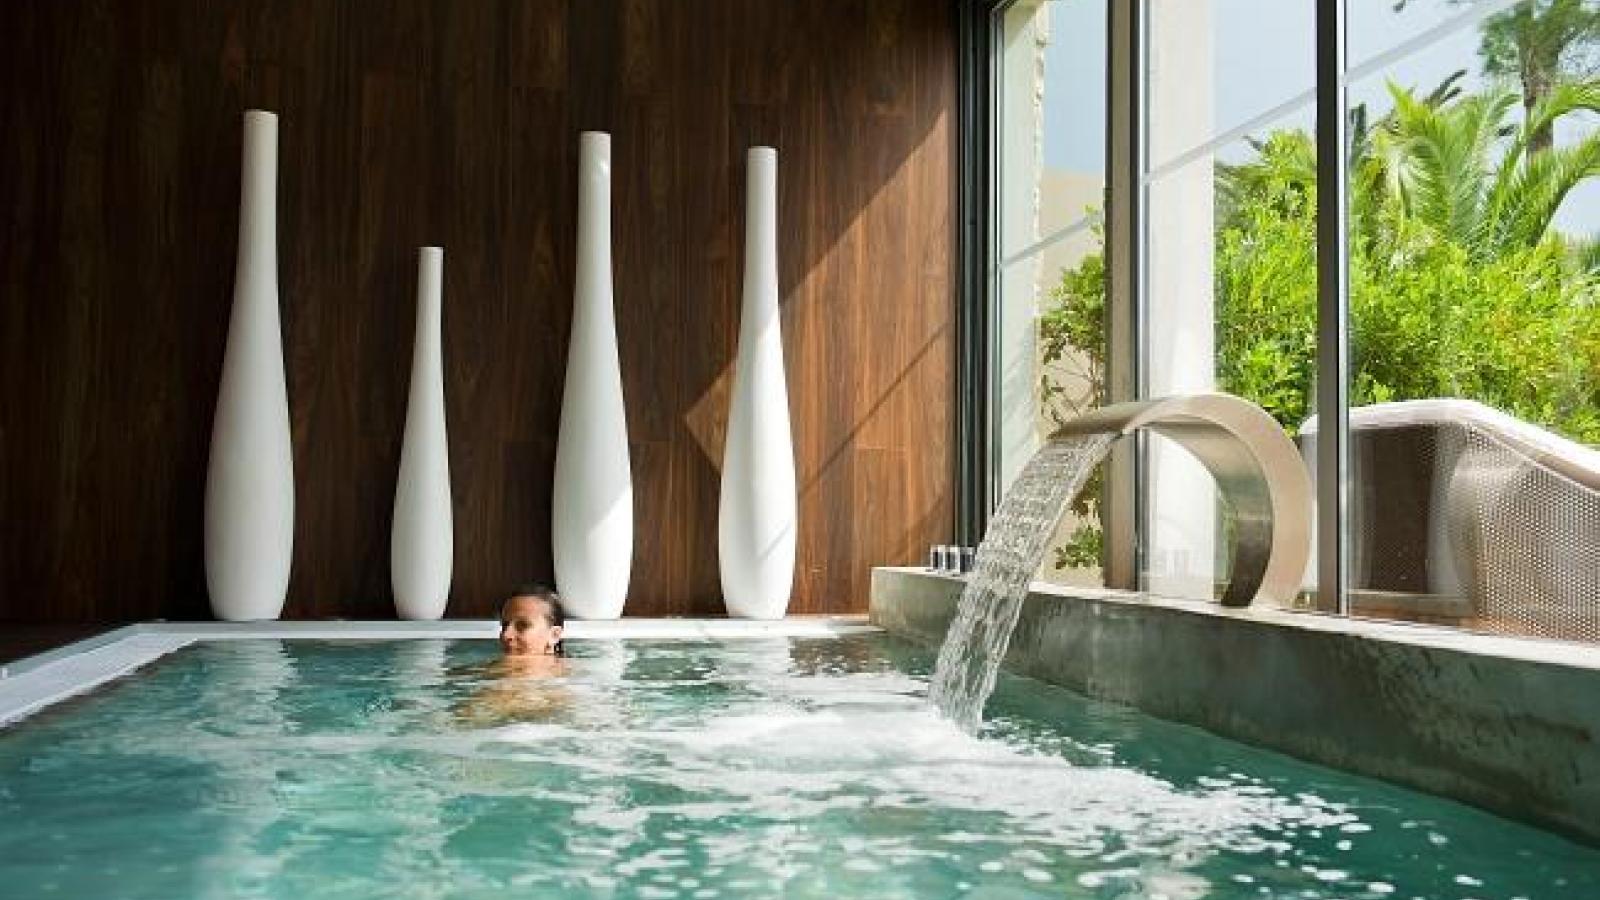 Luxury and wellness in Saint Tropez: the Hotel Sezz Way